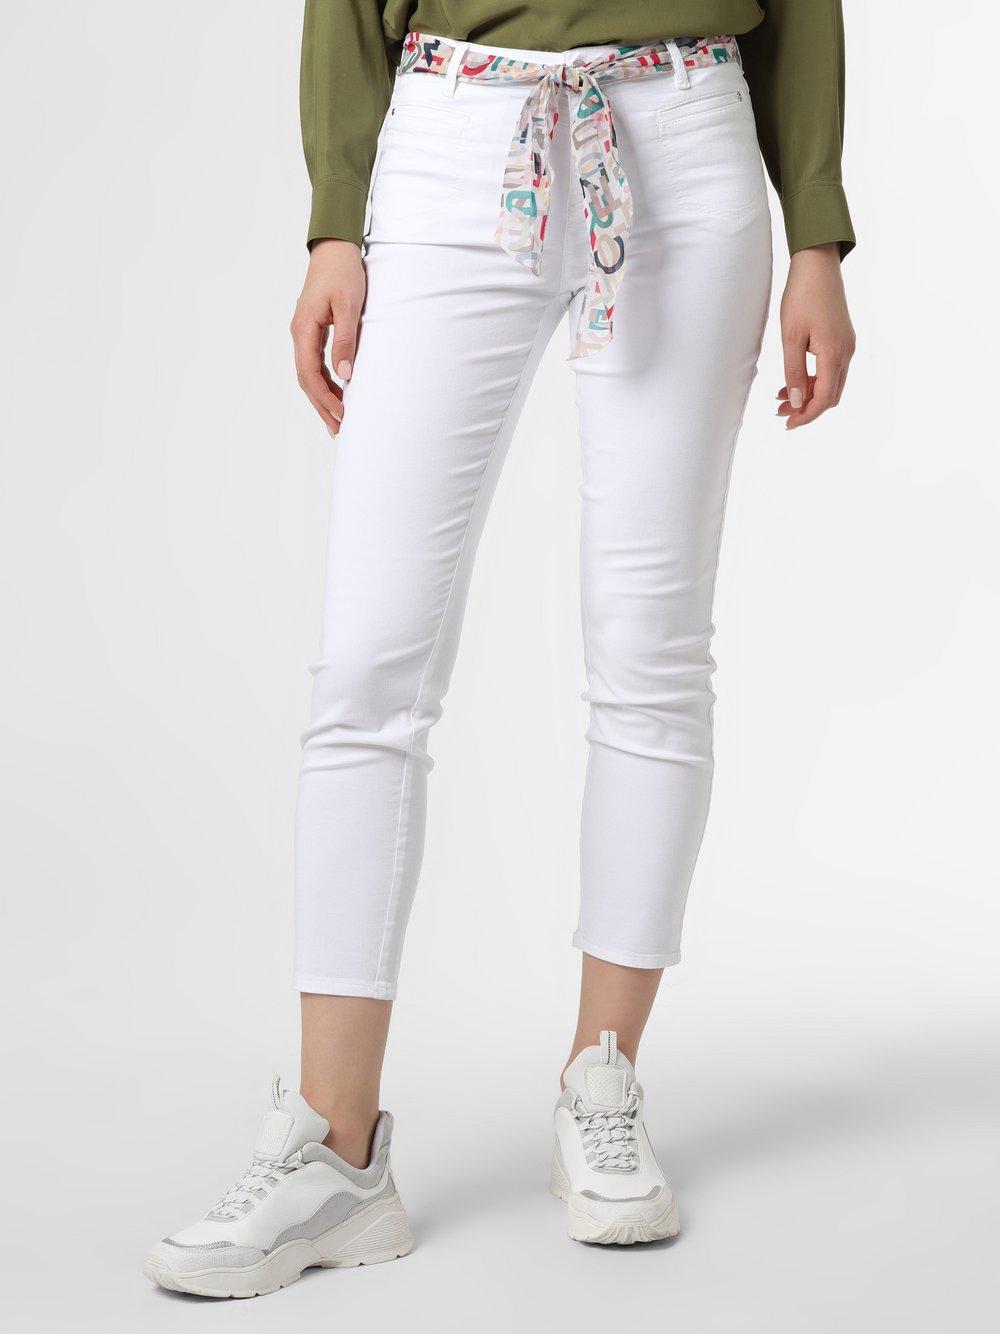 Rosner - Spodnie damskie – Alisa_084G, biały